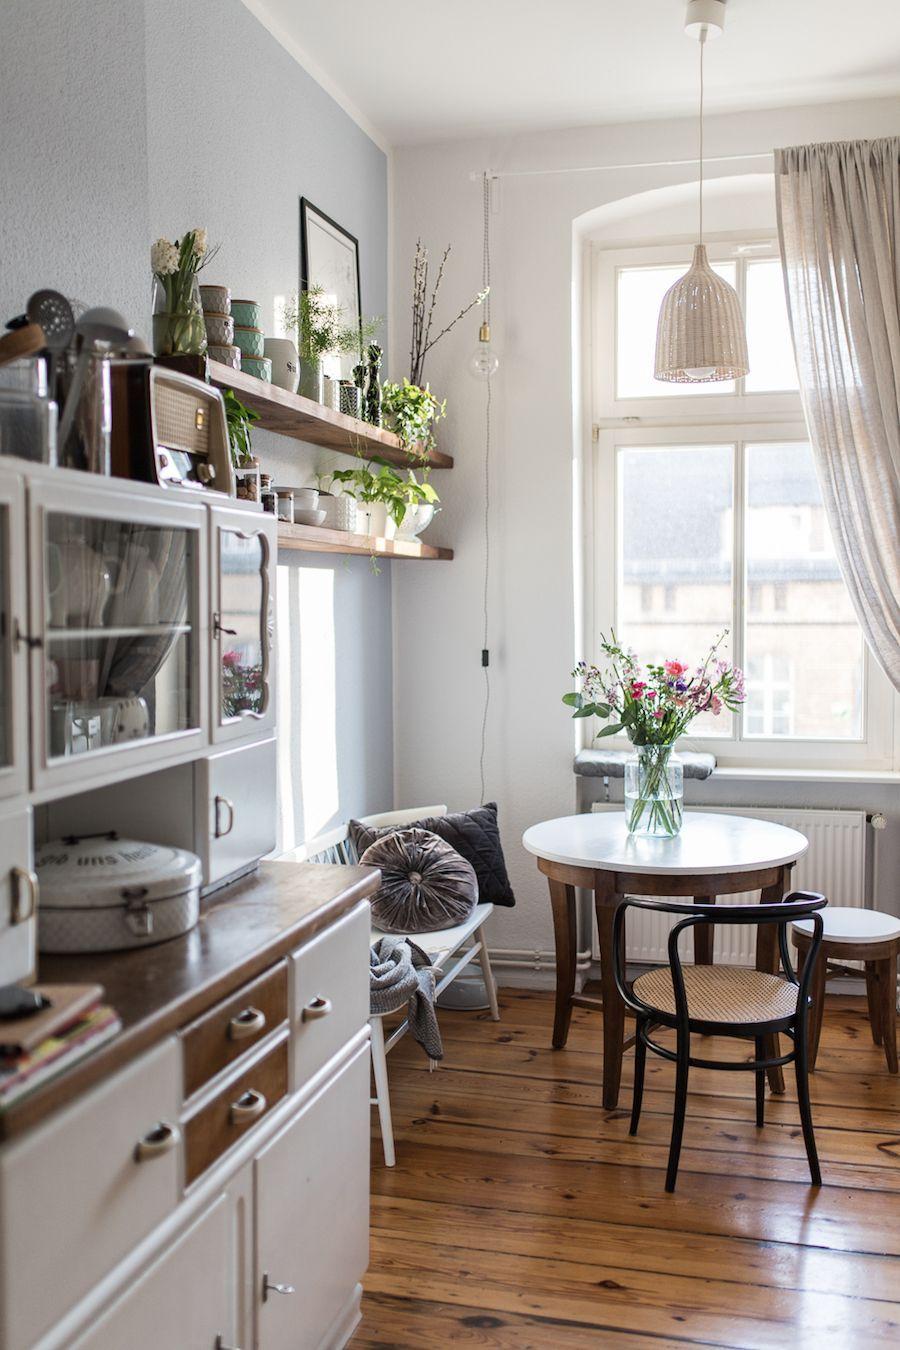 Photo of cucina vintage stretta # cucina domestica cucina vintage stretta